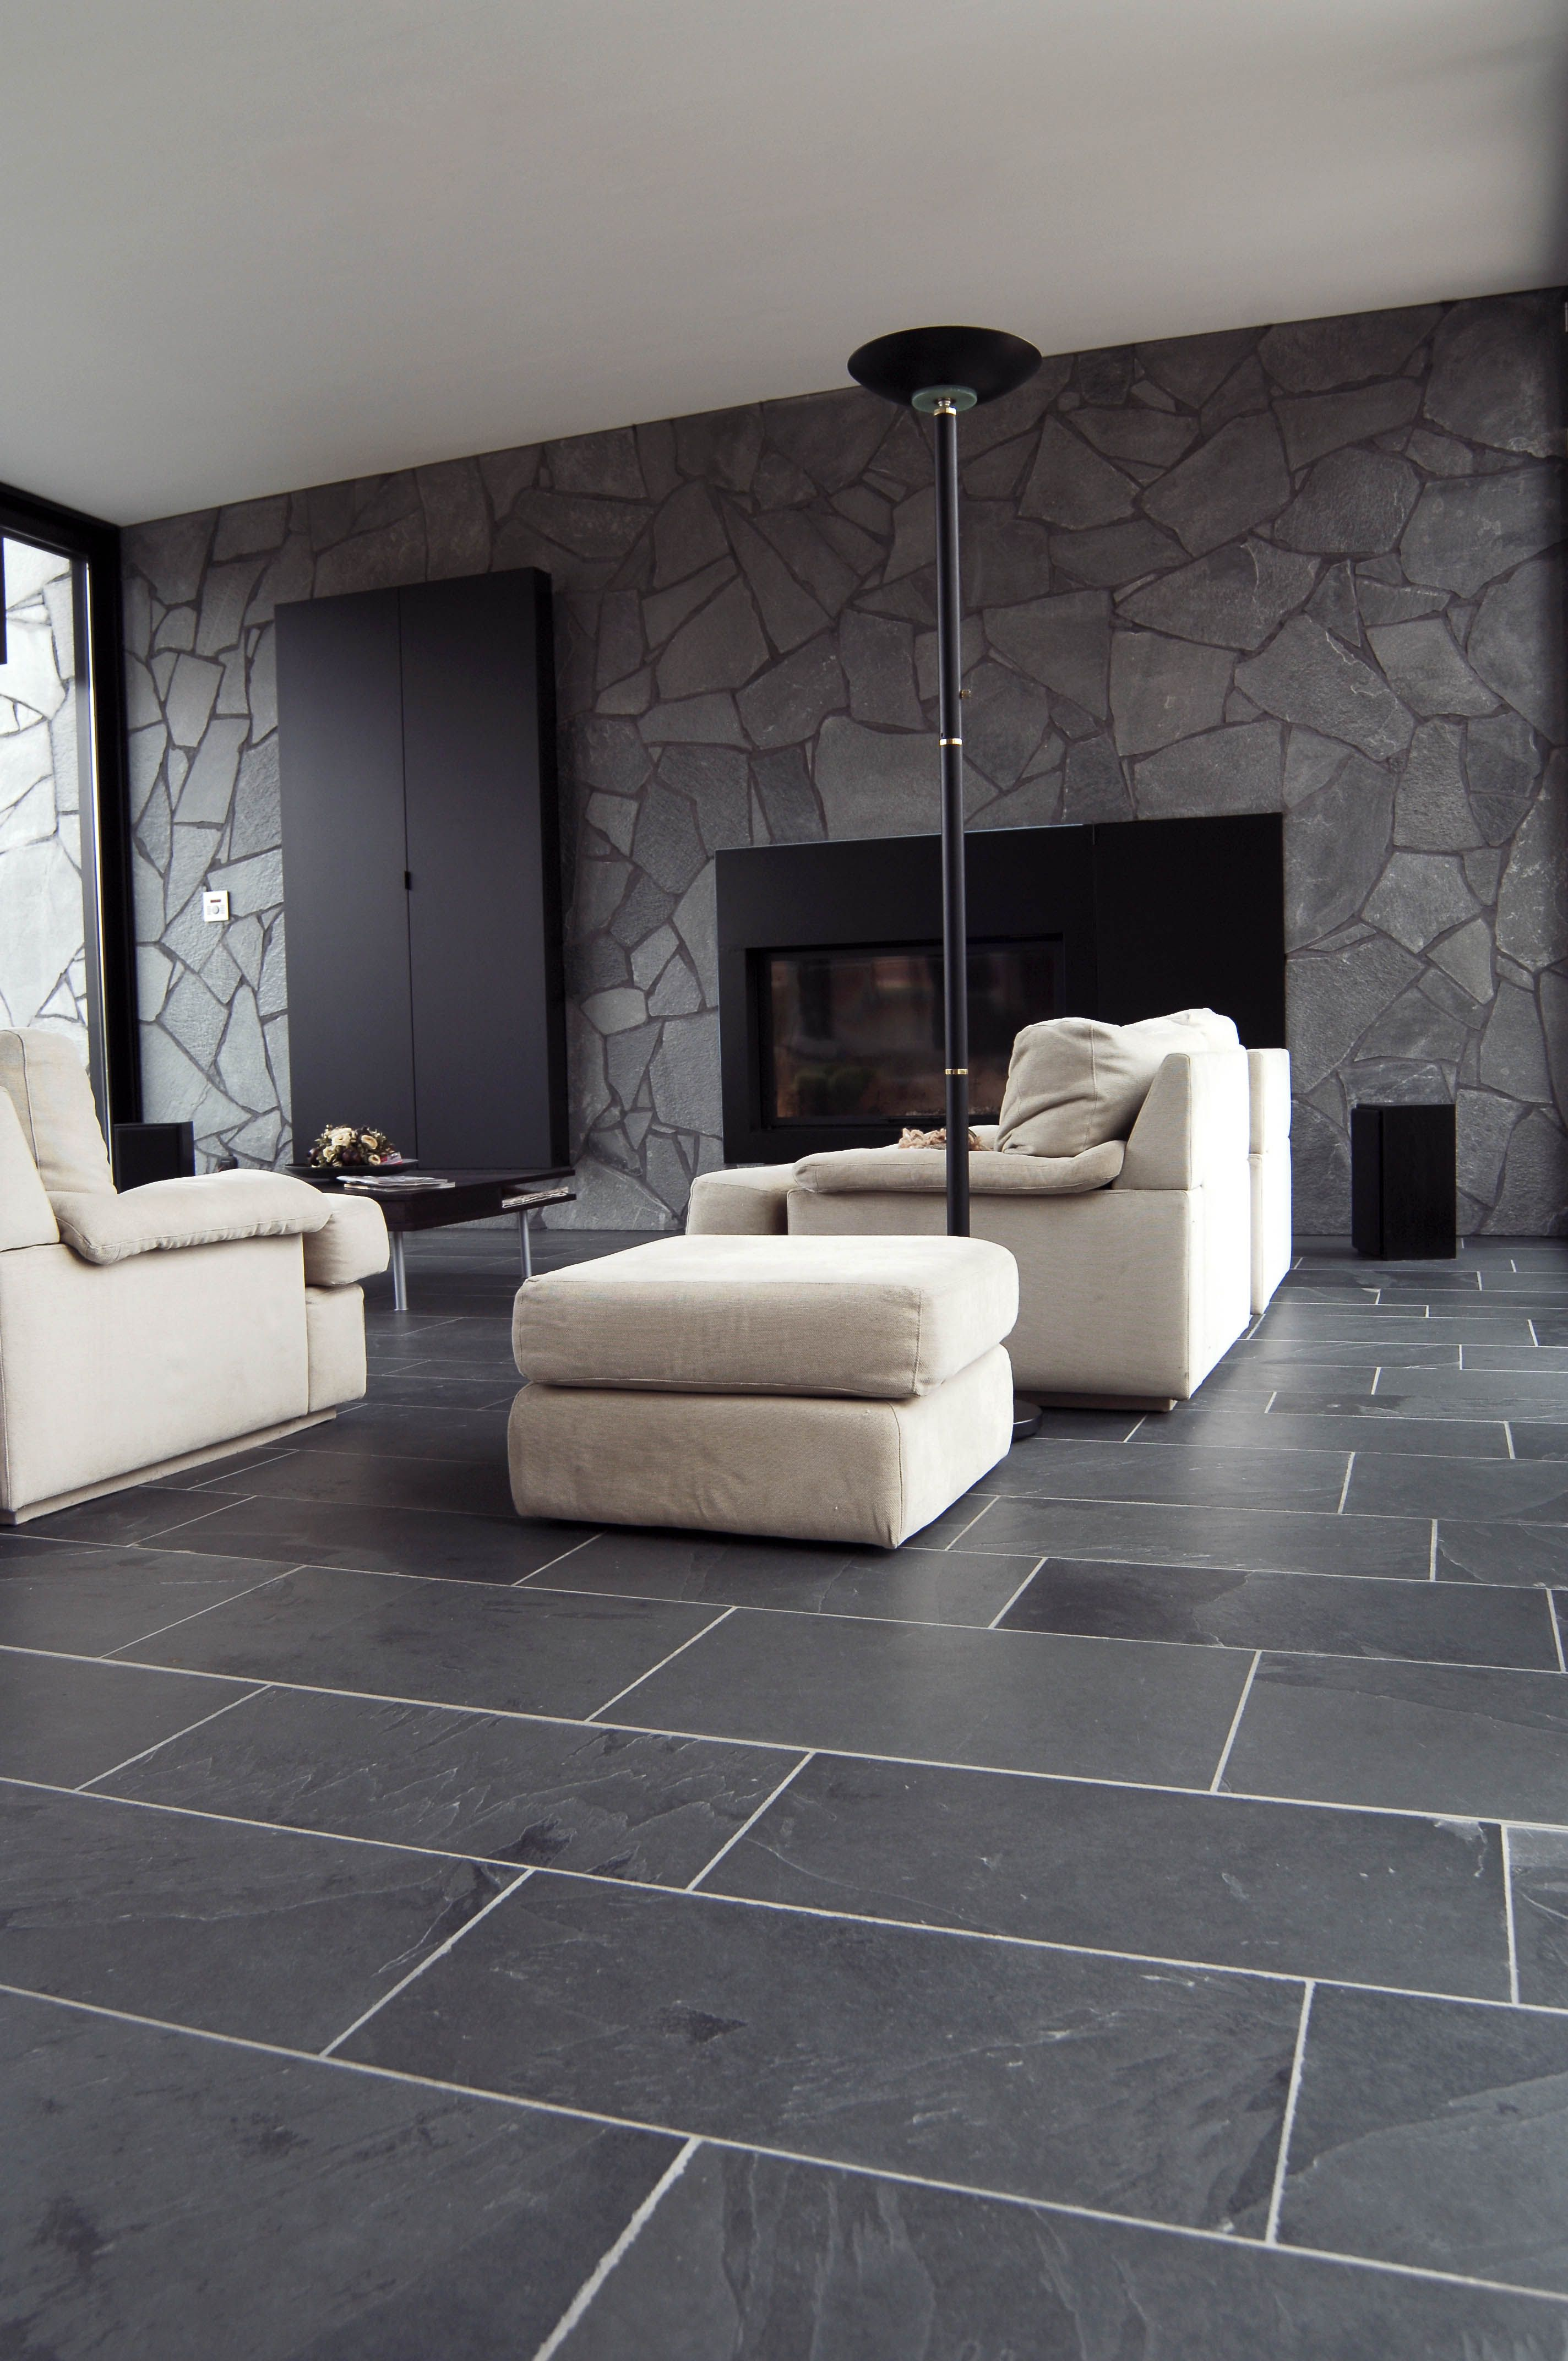 Slate Dark Greay Interiors Pic From Http Www Beltrami Co Uk